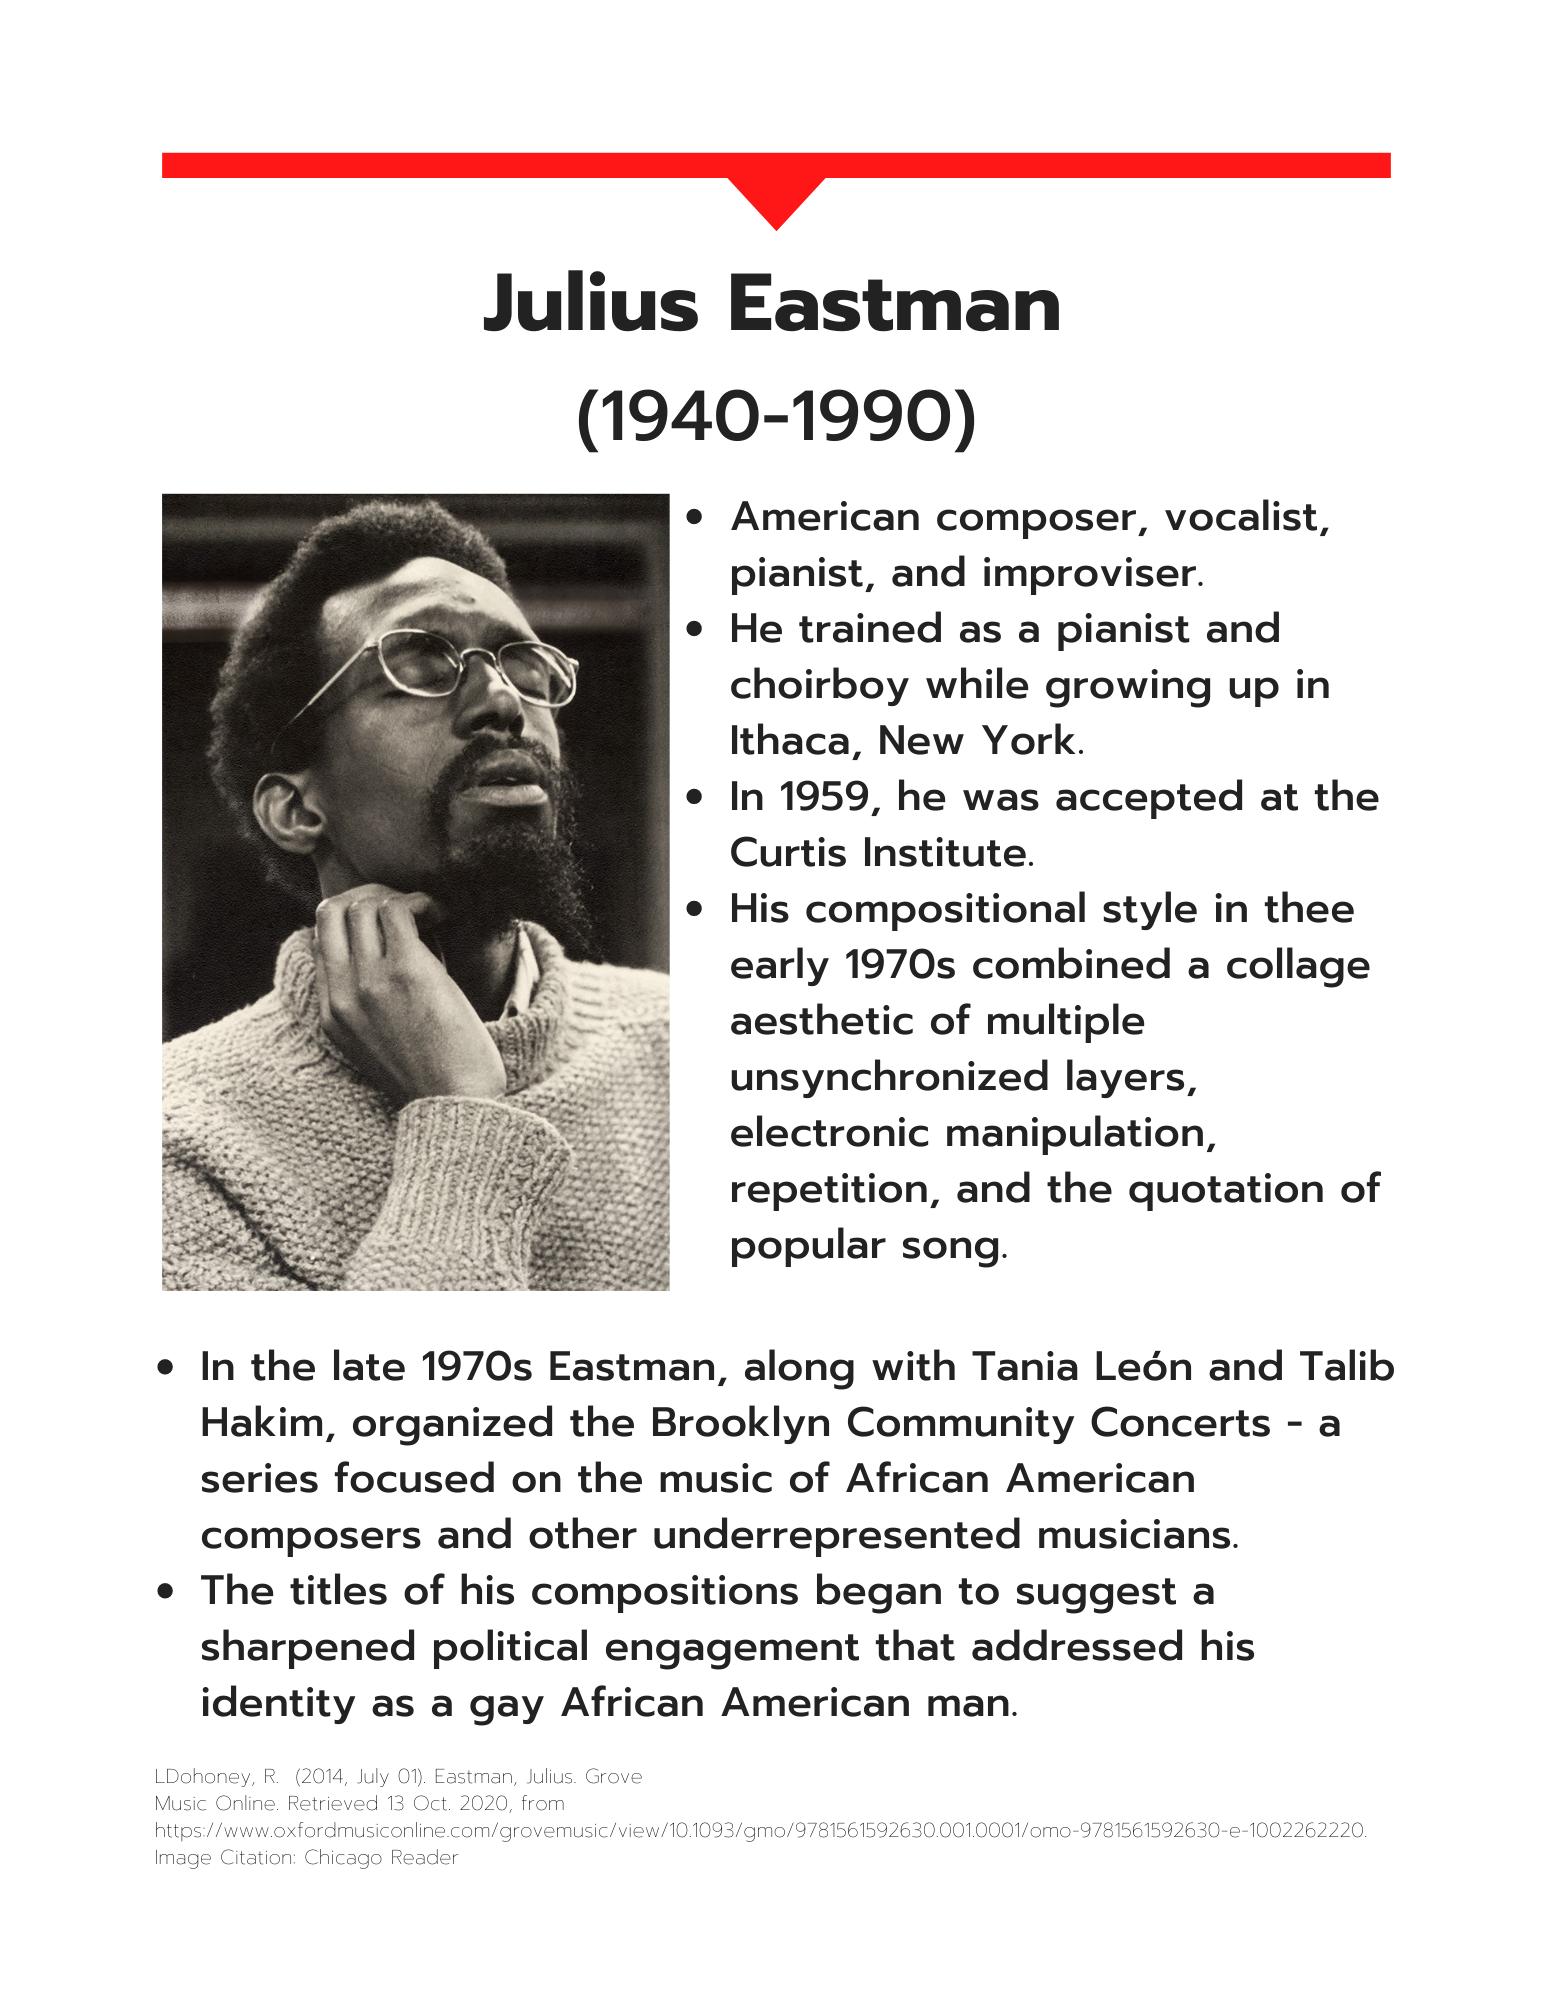 Julius Eastman information sheet art